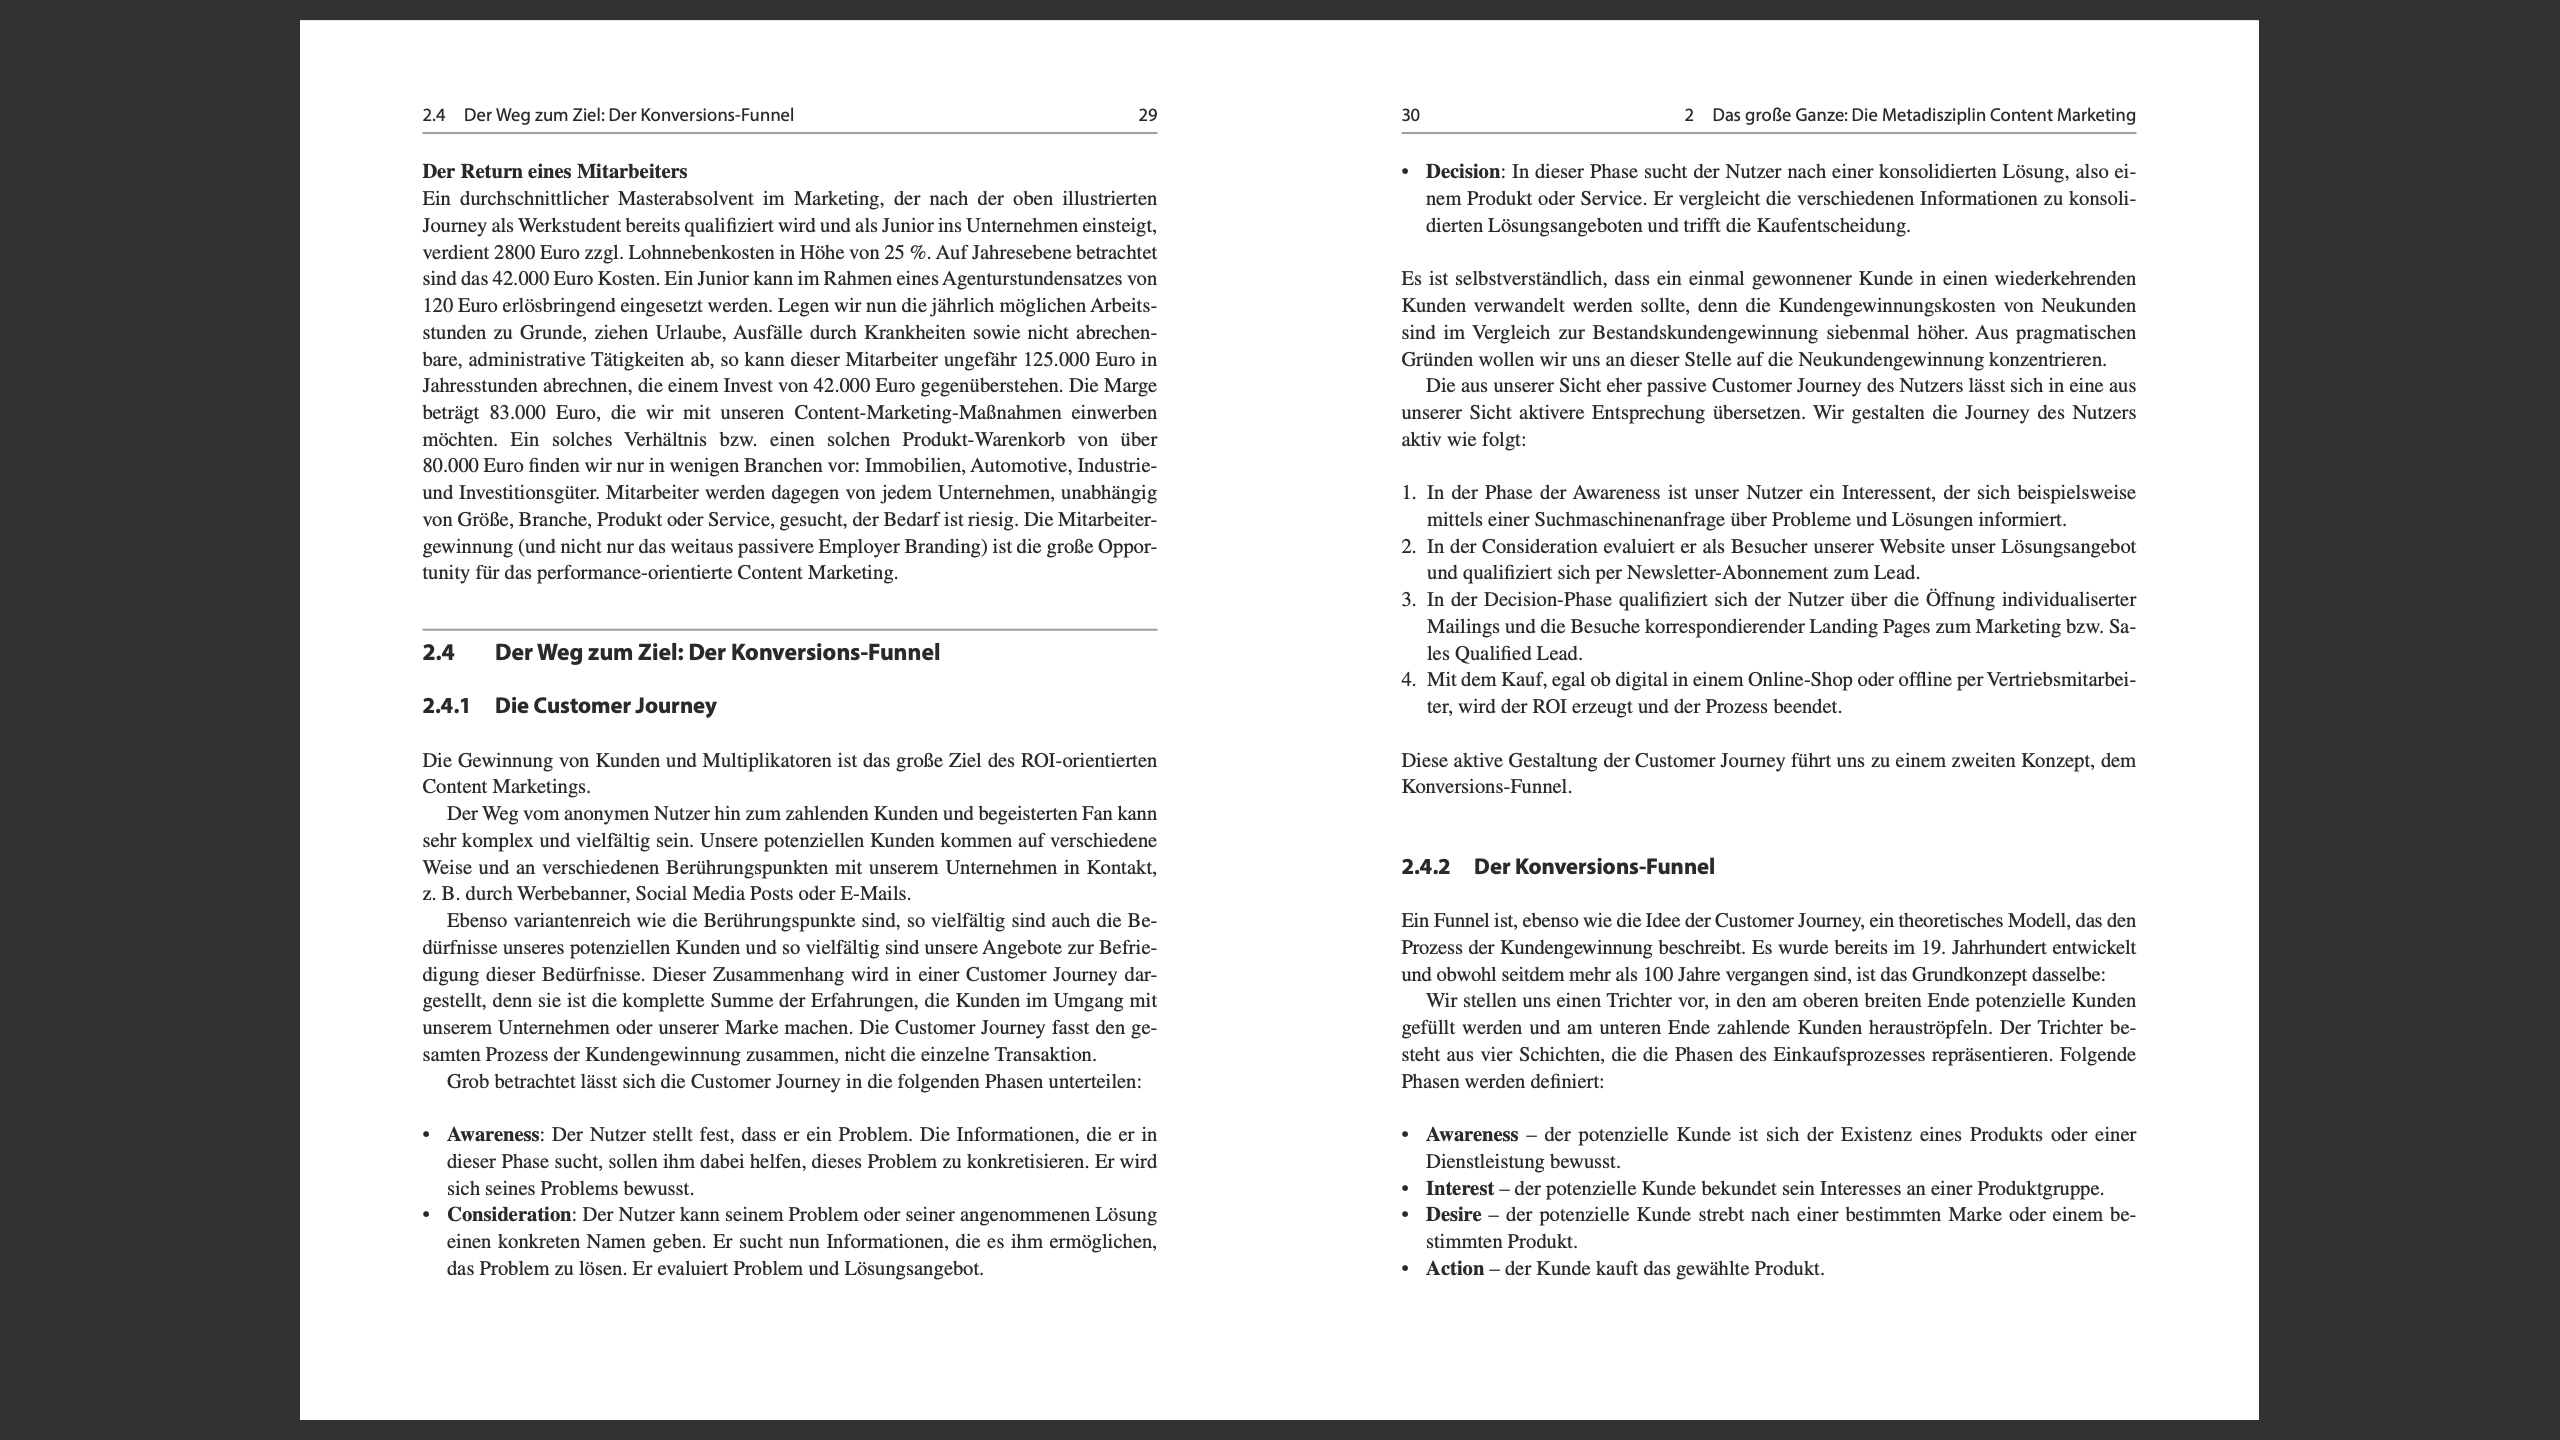 6-Methodisches-Content-Marketing-Gerrit-Grunert